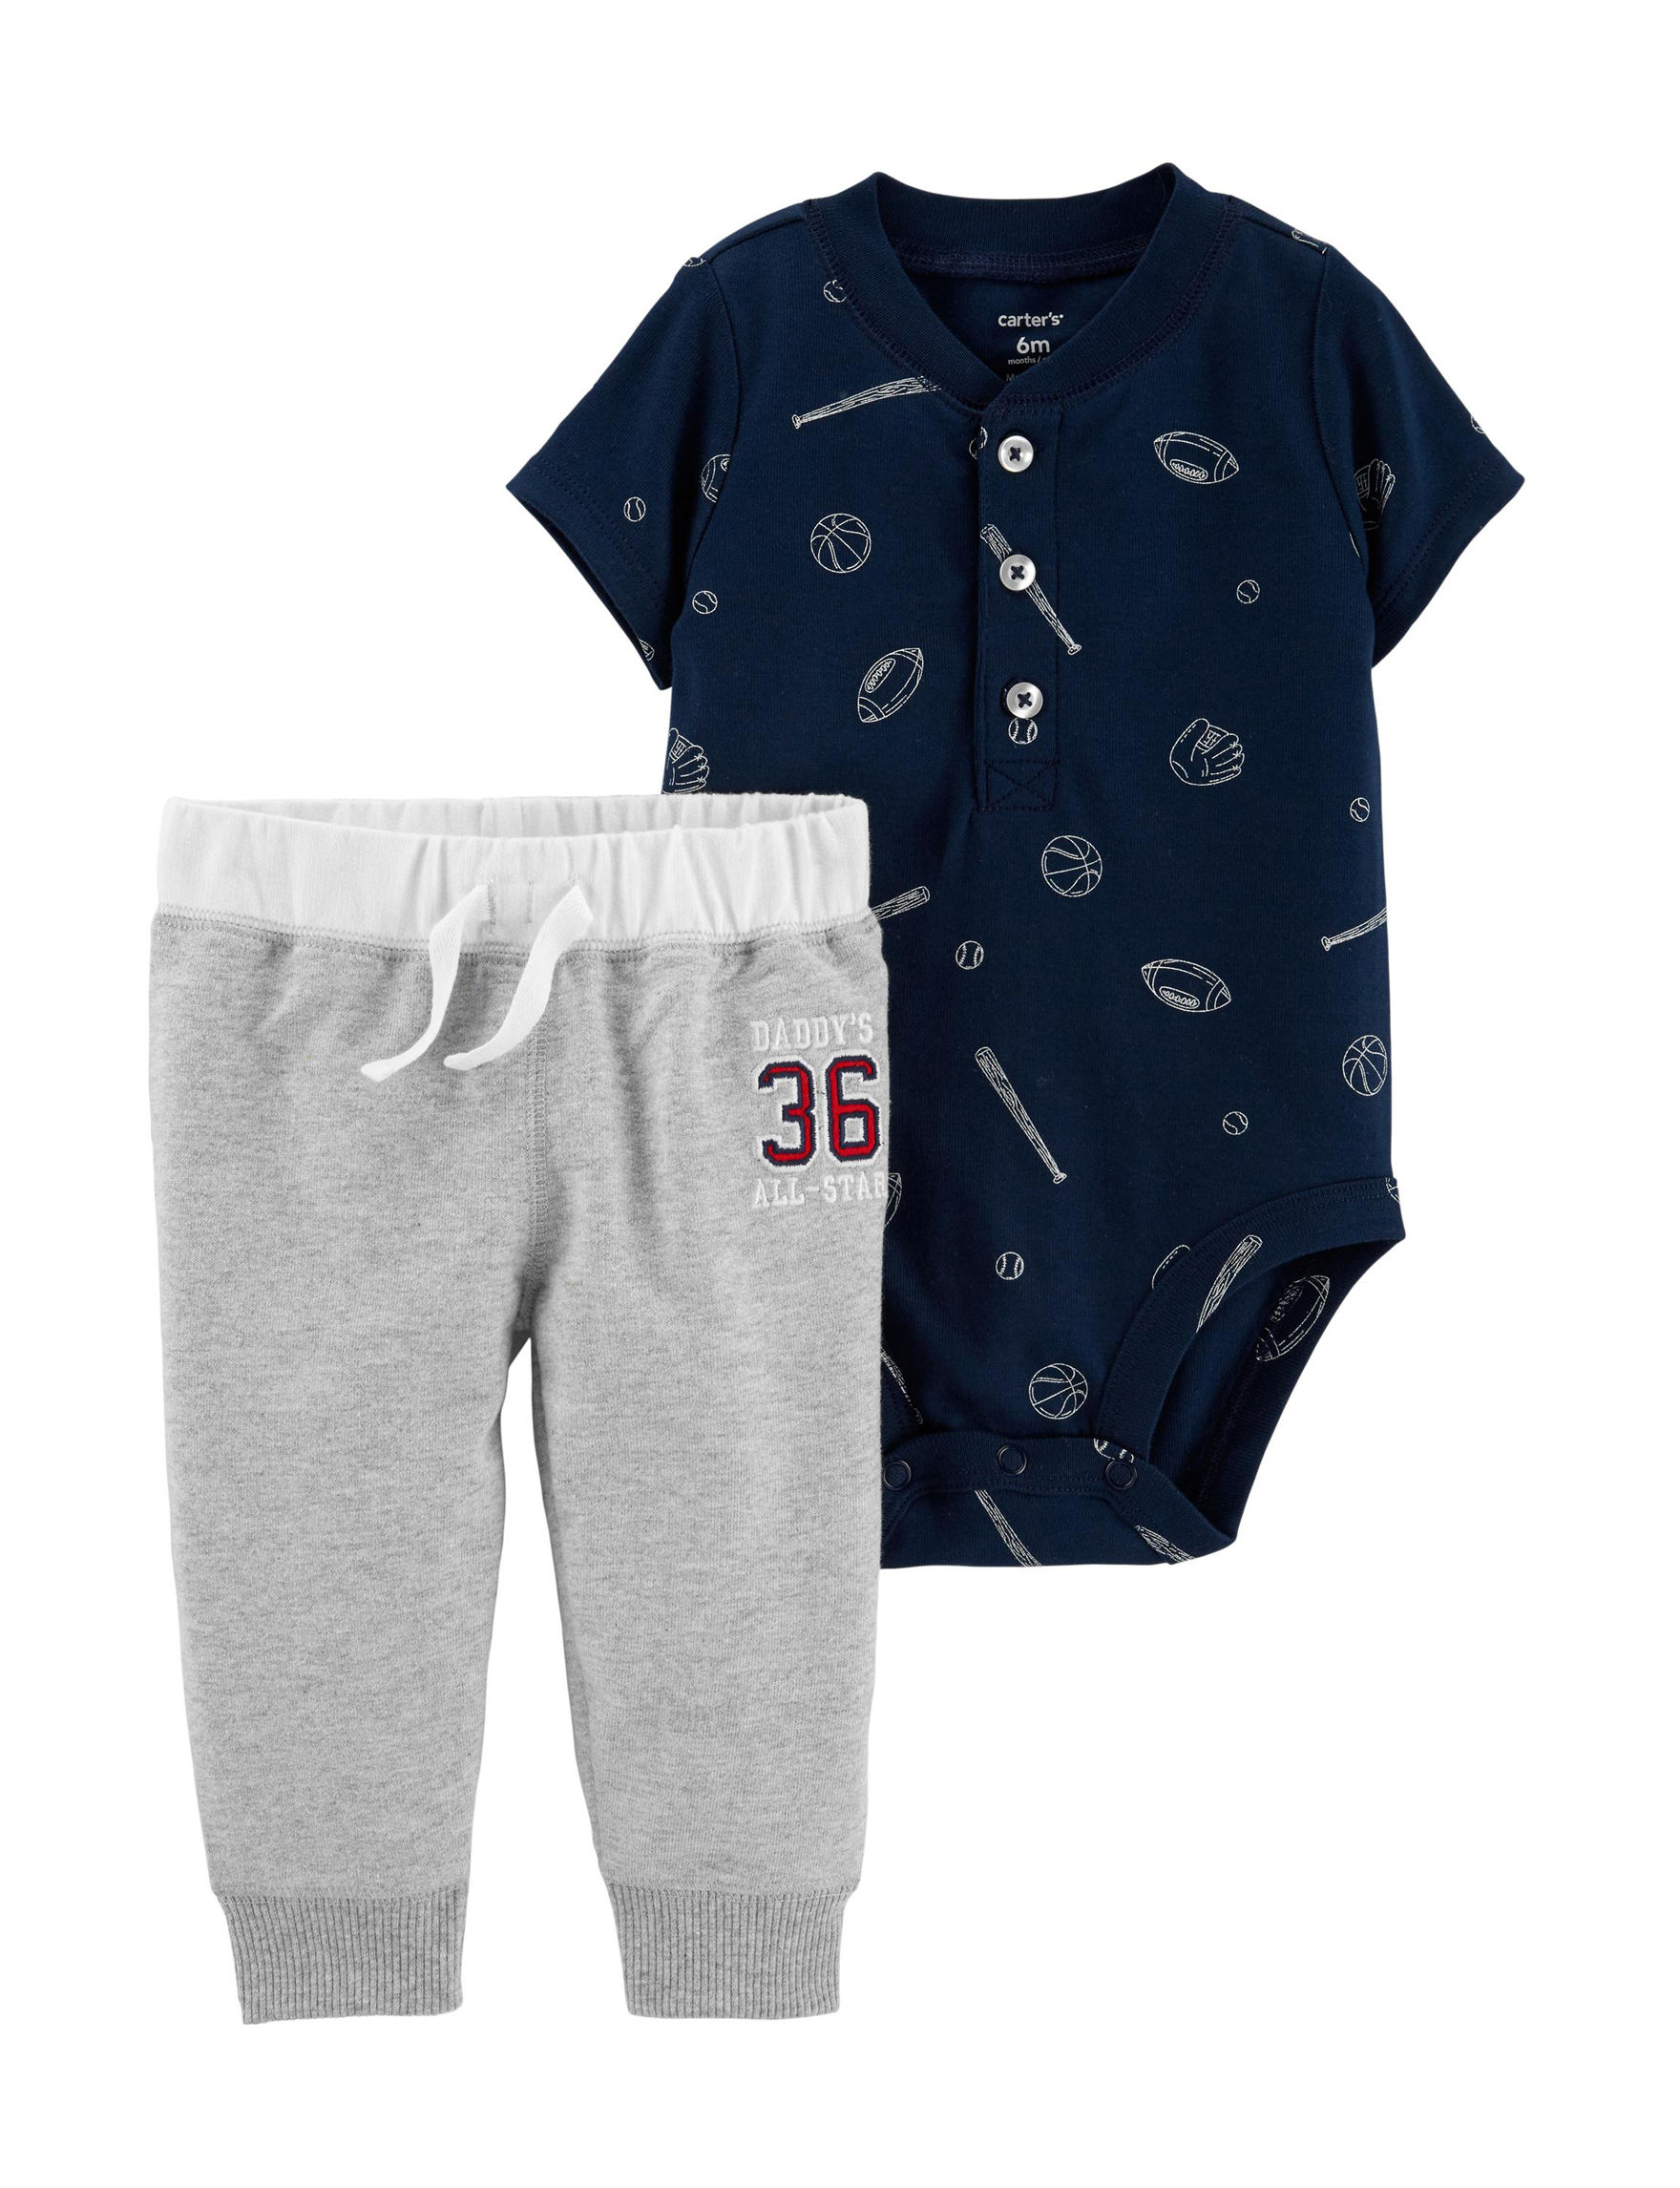 Carter's Navy / Grey